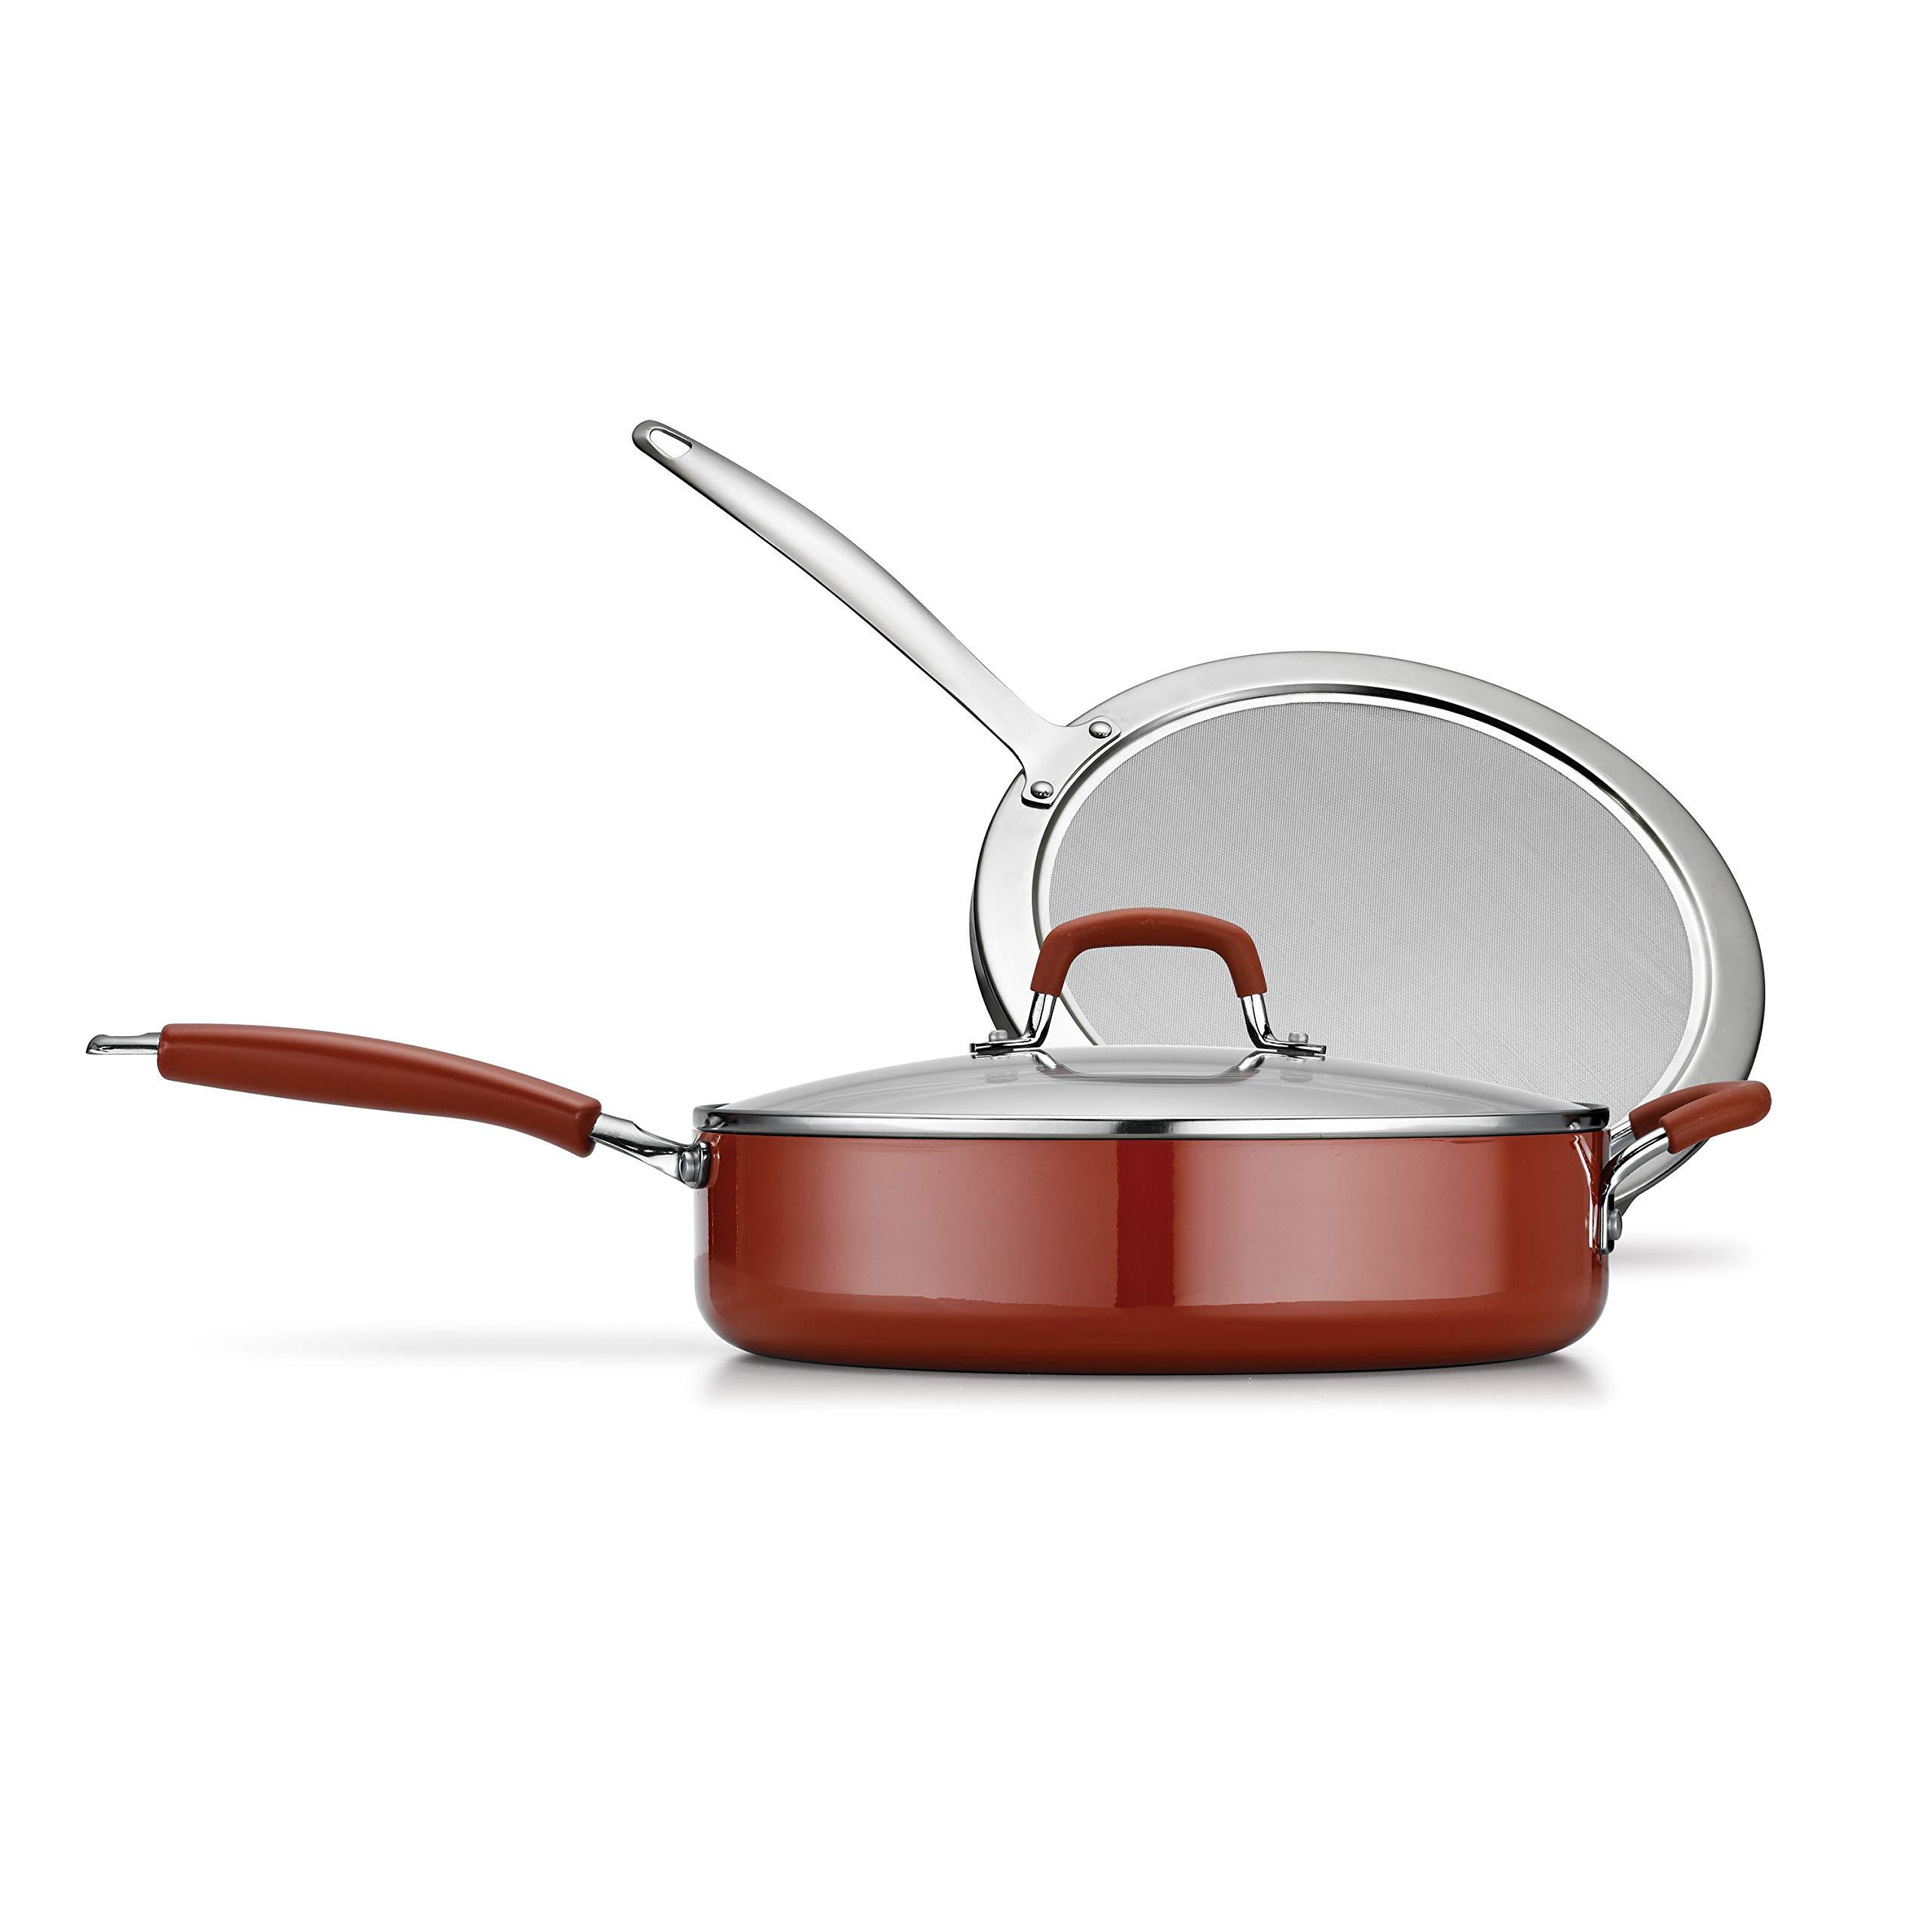 Tramontina 80151/504 Simple Cooking Aluminum Red Handles, 3 Piece, Porcelain Enamel Deep Saute Set, Spice